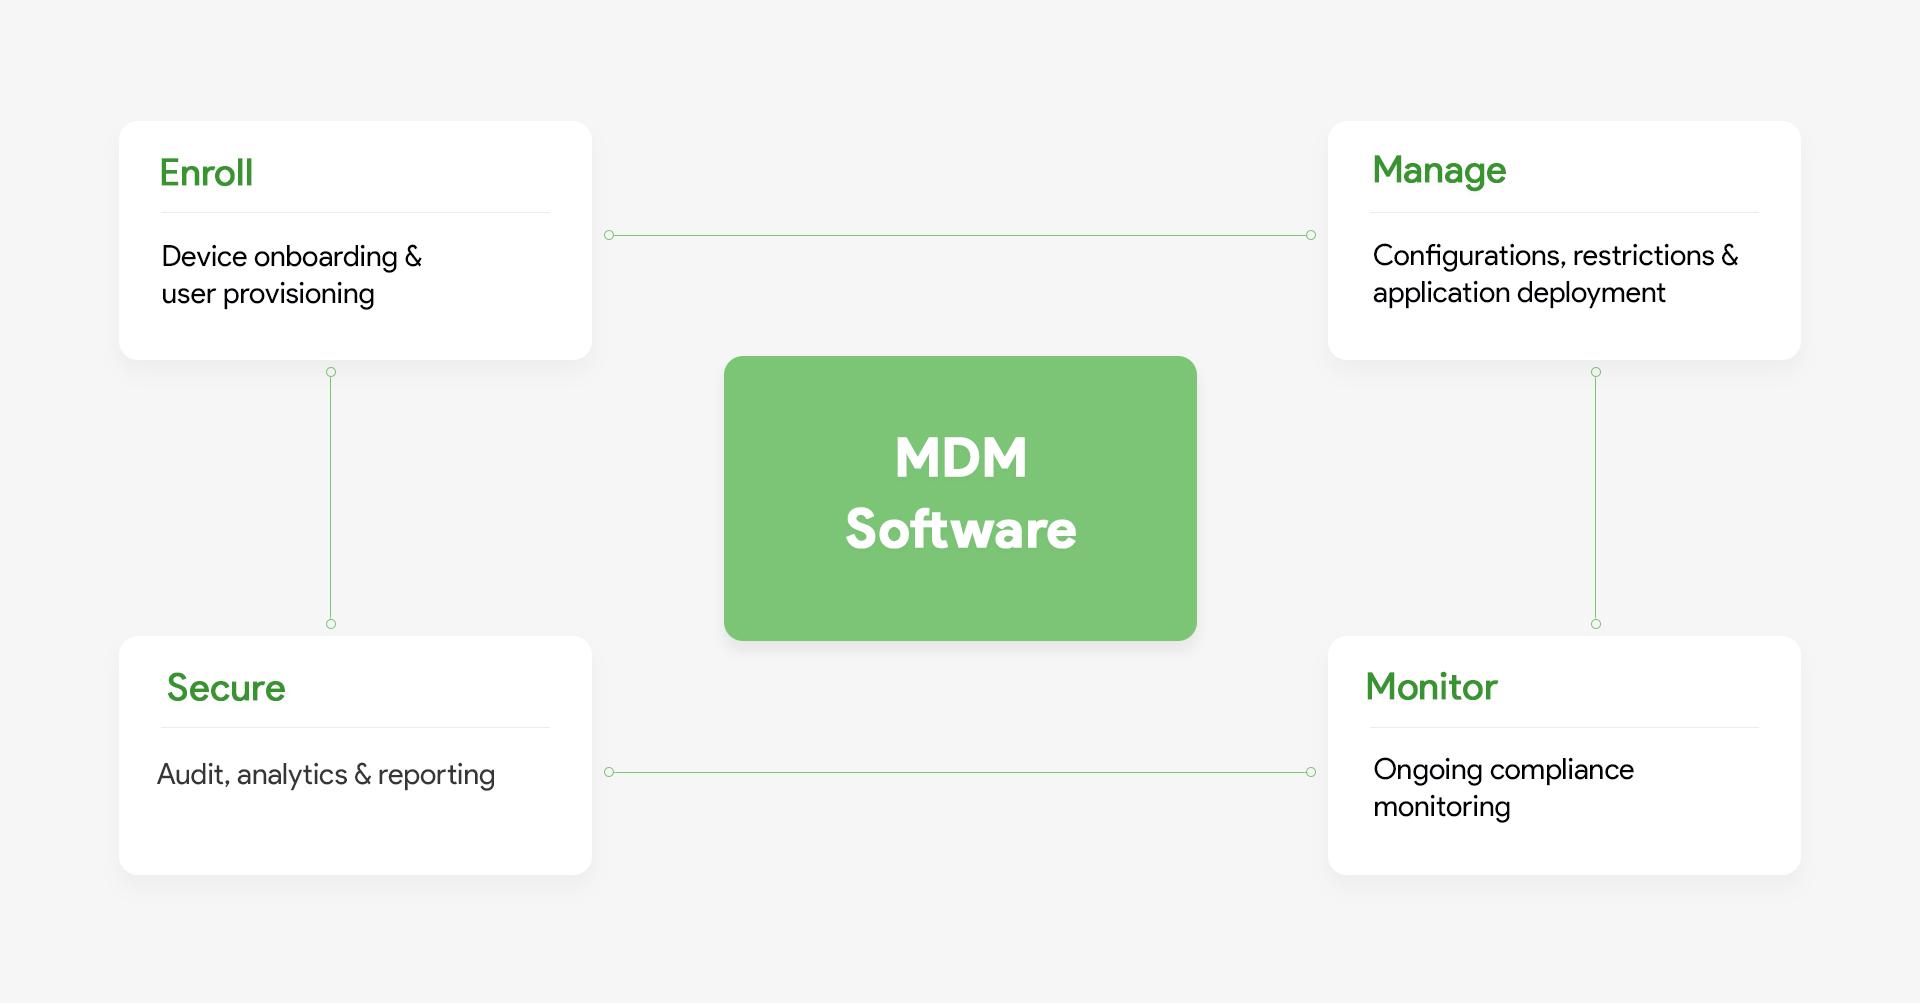 Mobile device management MDM functioning